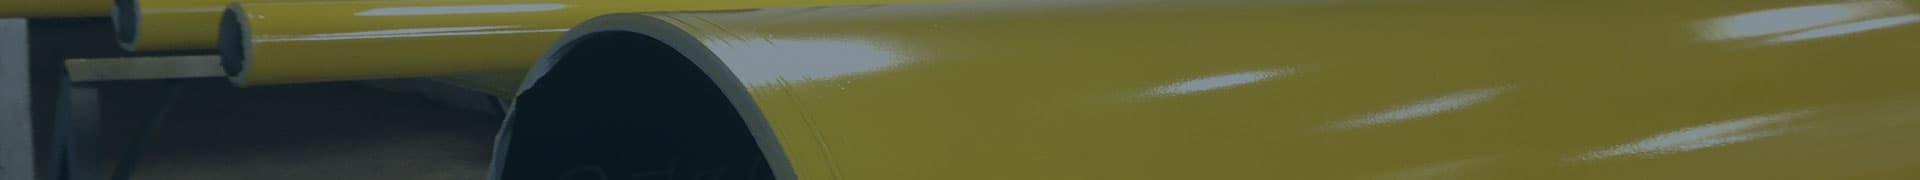 pintura-estrutura-metalica